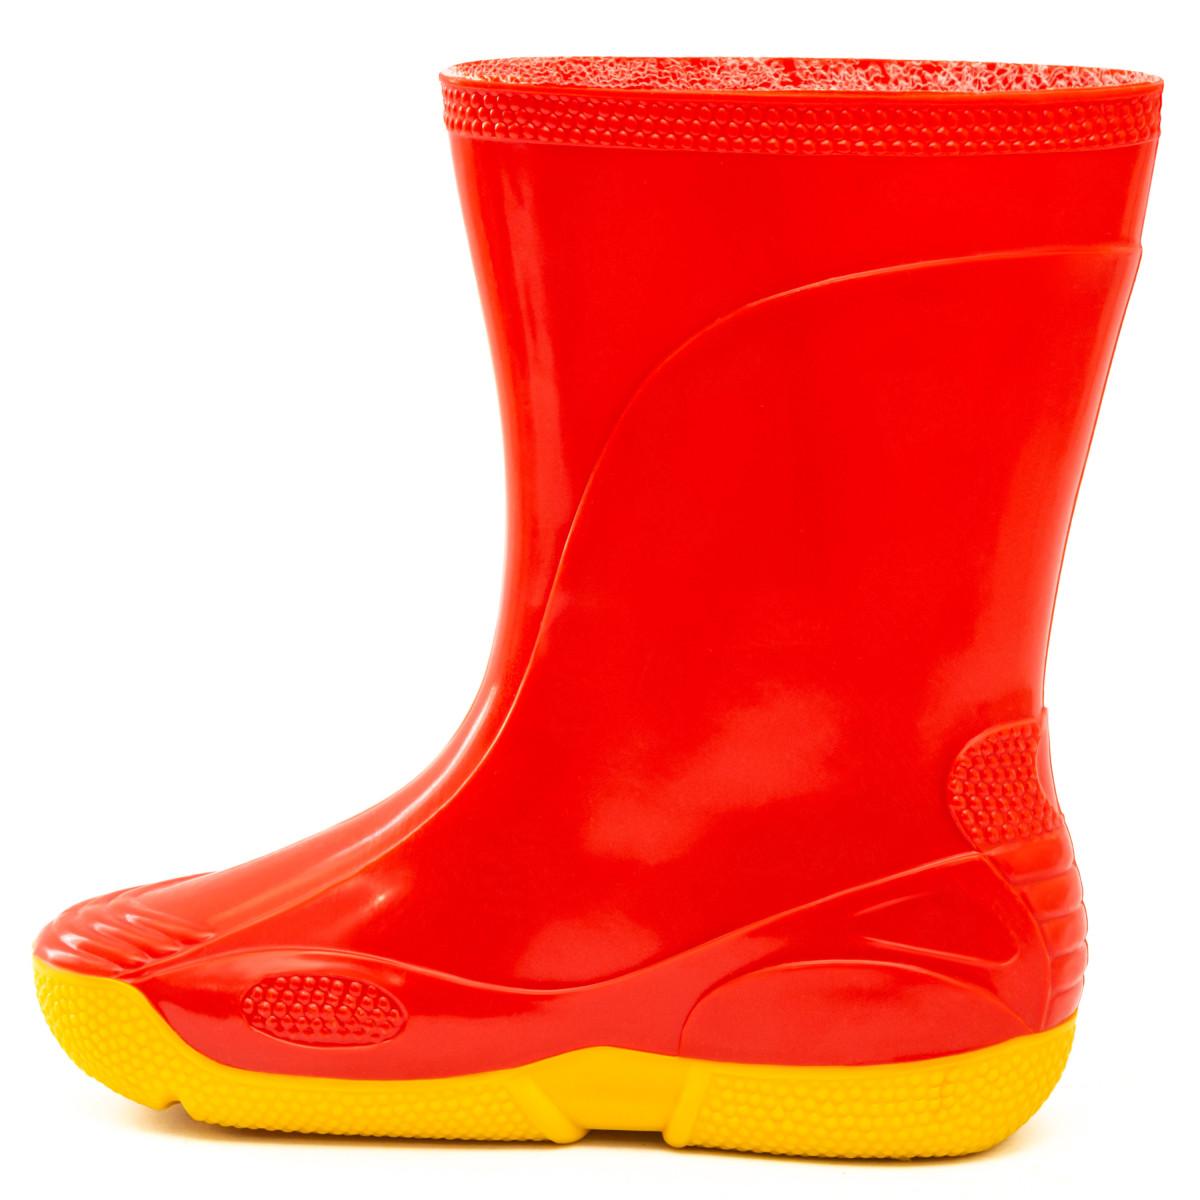 Kids' Wellies VIVID, Red/Yellow